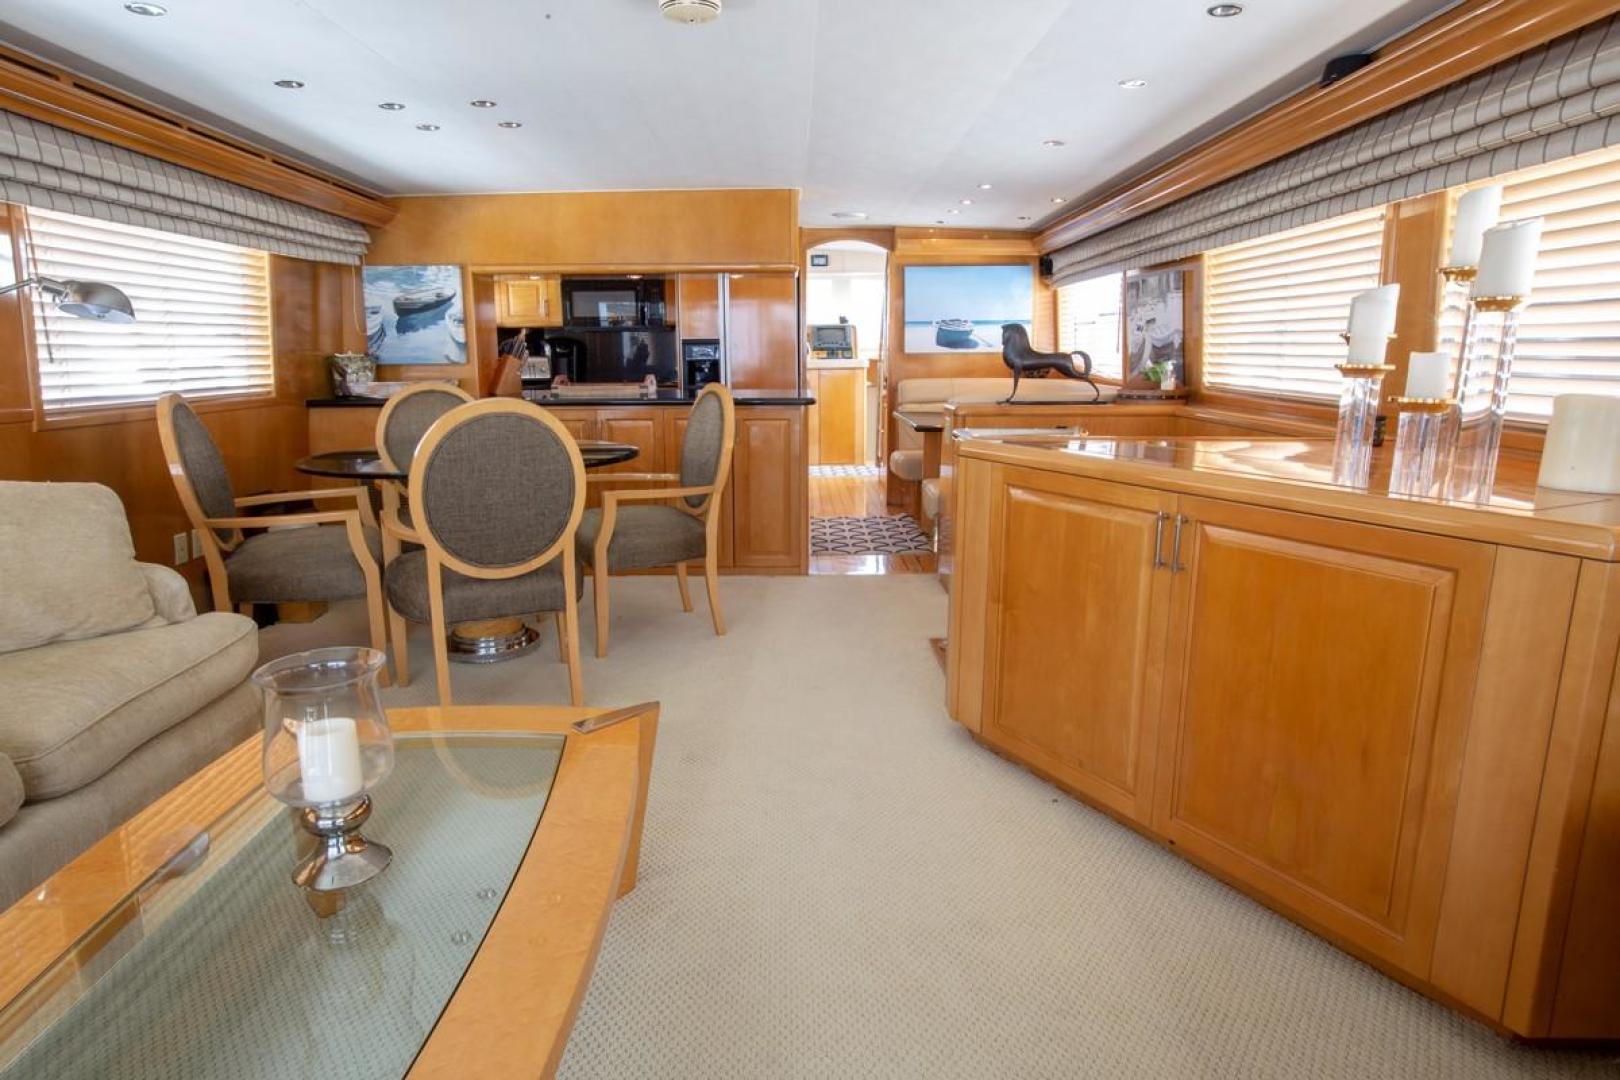 Hatteras-Cockpit Motor Yacht 2000-Getaway Ft. Lauderdale-Florida-United States-977362 | Thumbnail